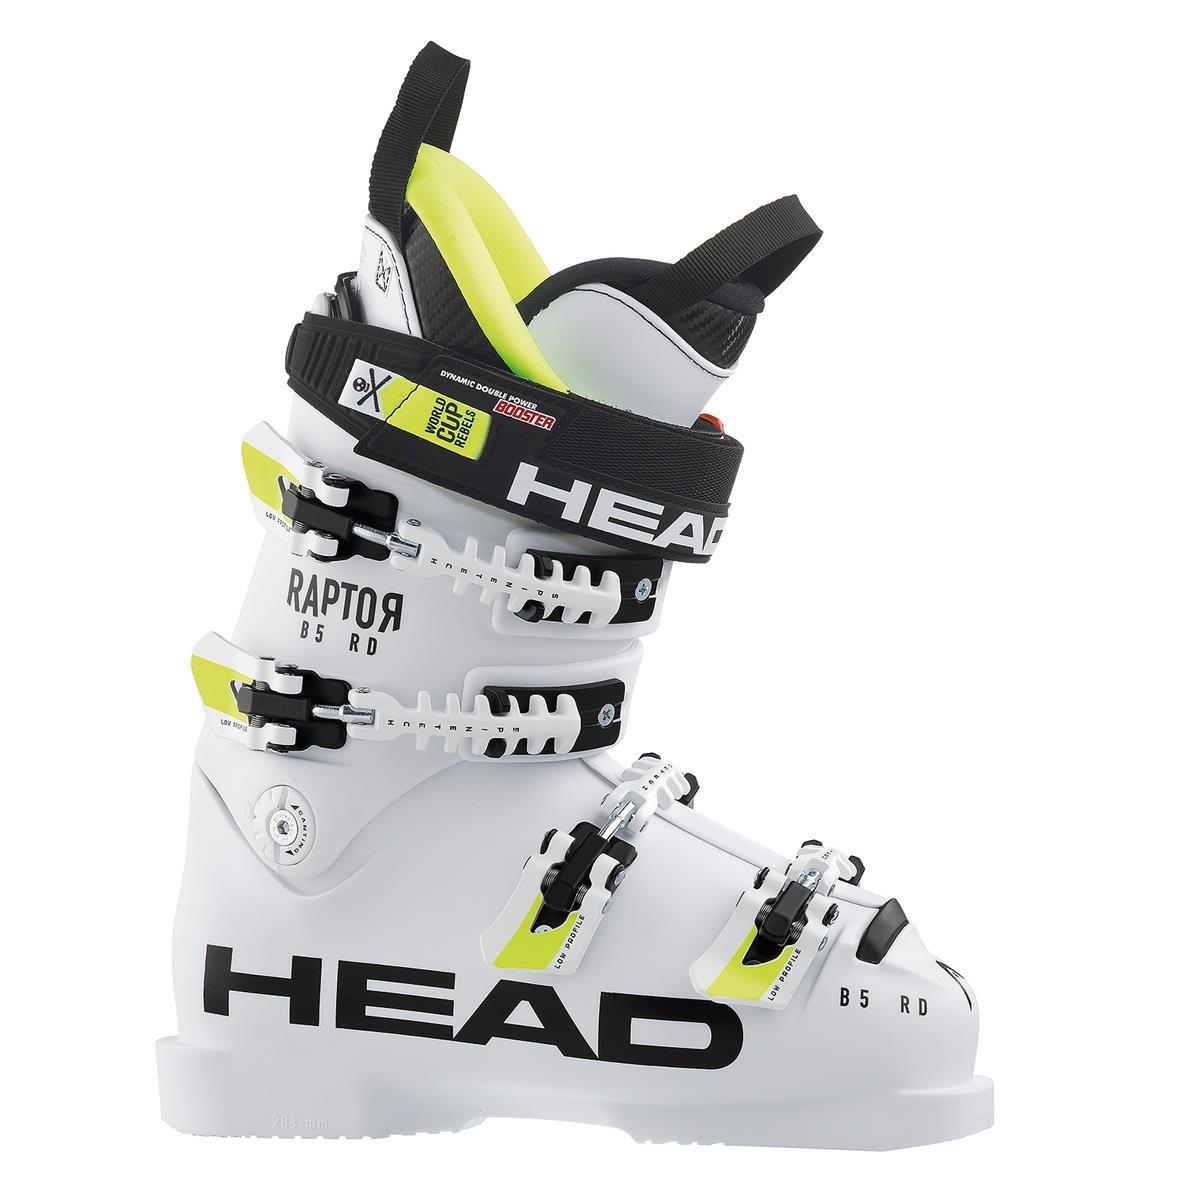 HEAD Raptor B5 RD ジュニアレースブーツ (11827) 25.5